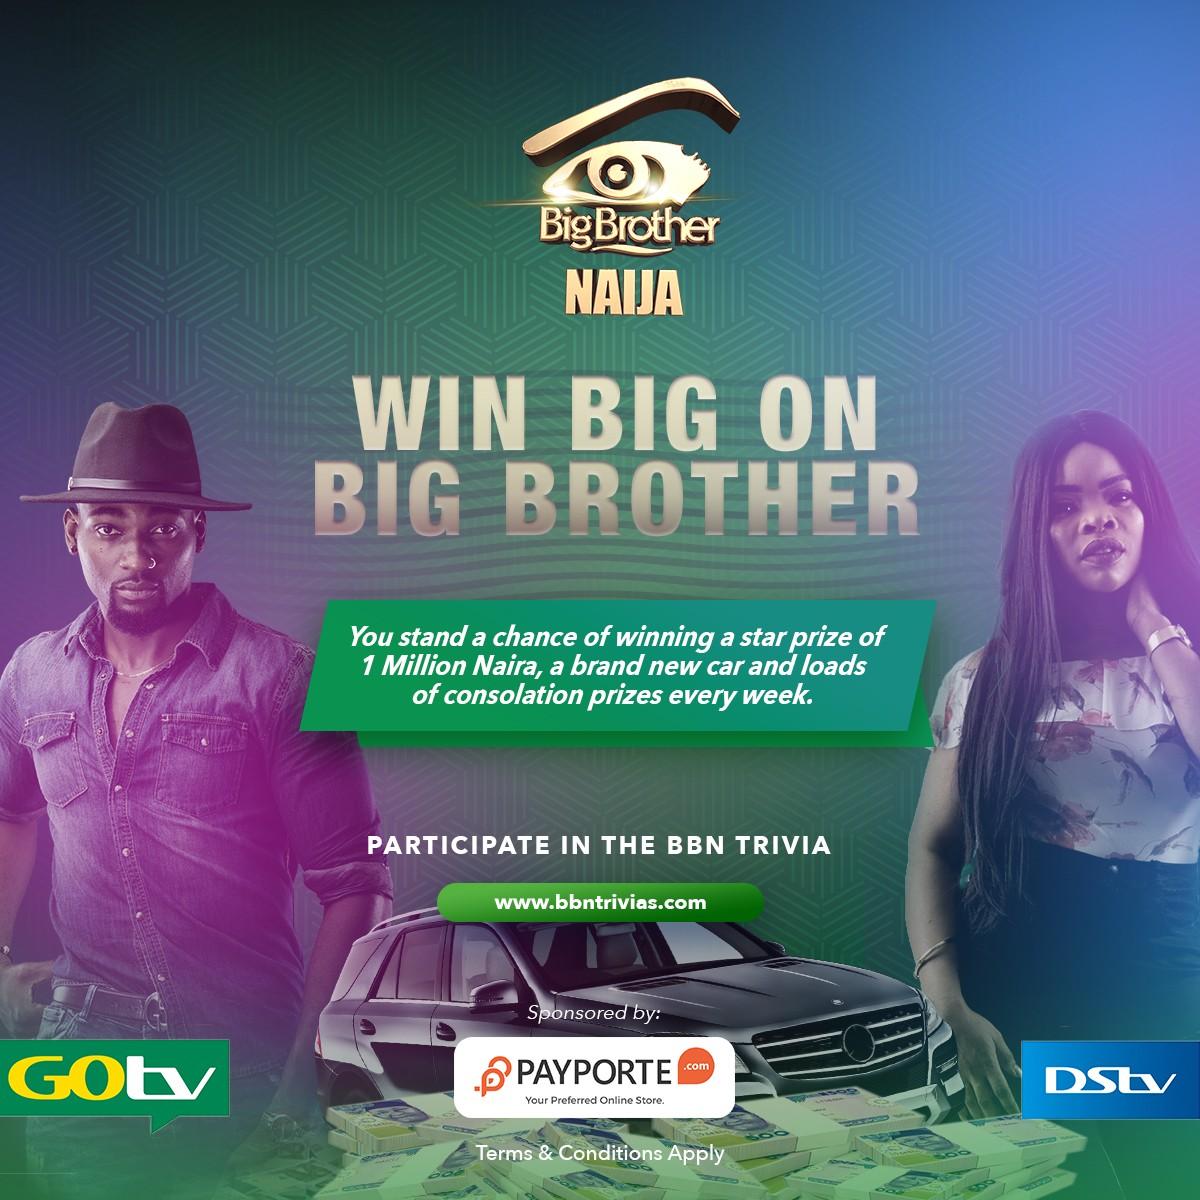 Win big on Big Brother Naijia Trivia